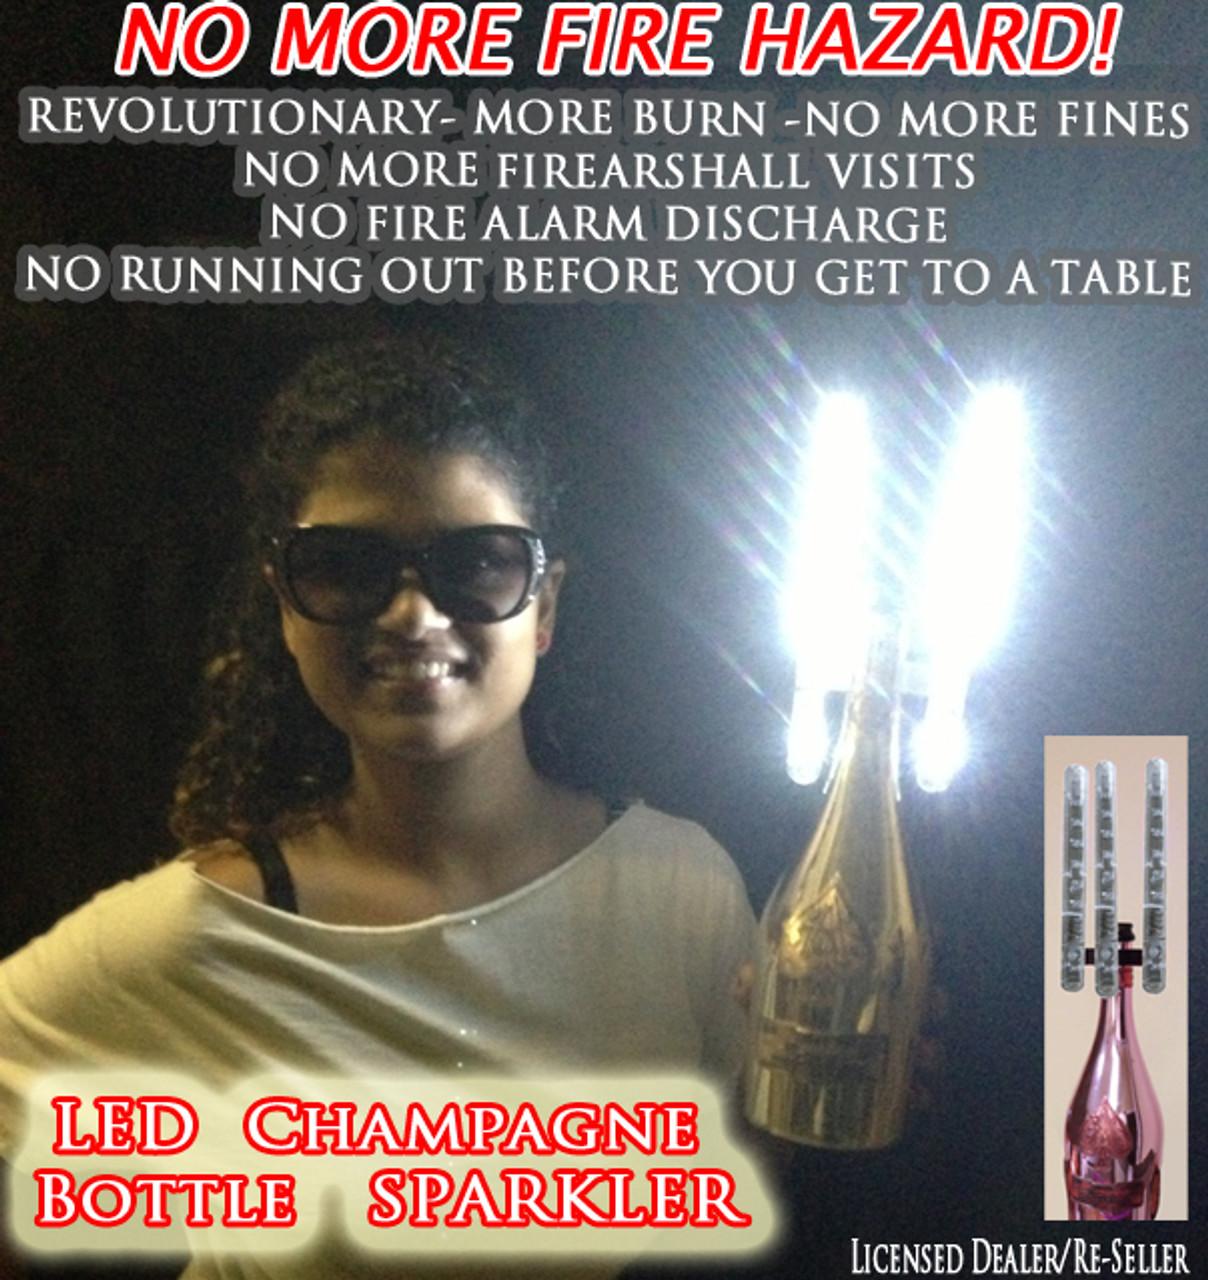 led bottle sparklers, led nite sparx, led night sparks, led nite sparks, led night sparx, led bottle sparkler, bottle service alternative, champagne bottle sparkler alternative, vip bottle service, vipsparklers, nightlifesupplier.com, bottle, service, sparklers, sparkler, bottle, ice fountain, led ice fountain, cake sparklers, led cake sparkler, electronic sparkler, electronic bottle sparkler, electronic bottle service sparkler, led nite sparx, vip sparkler, electronic sparkler, bottle sparkler, bottle service, led sparkler 3, lednightclubsparkler,  LED, Bottle, Sparkler, Nite, Sparx, NiteSparx, electronic, e-sparkler, esparkler, e sparkle, Nite Sparx